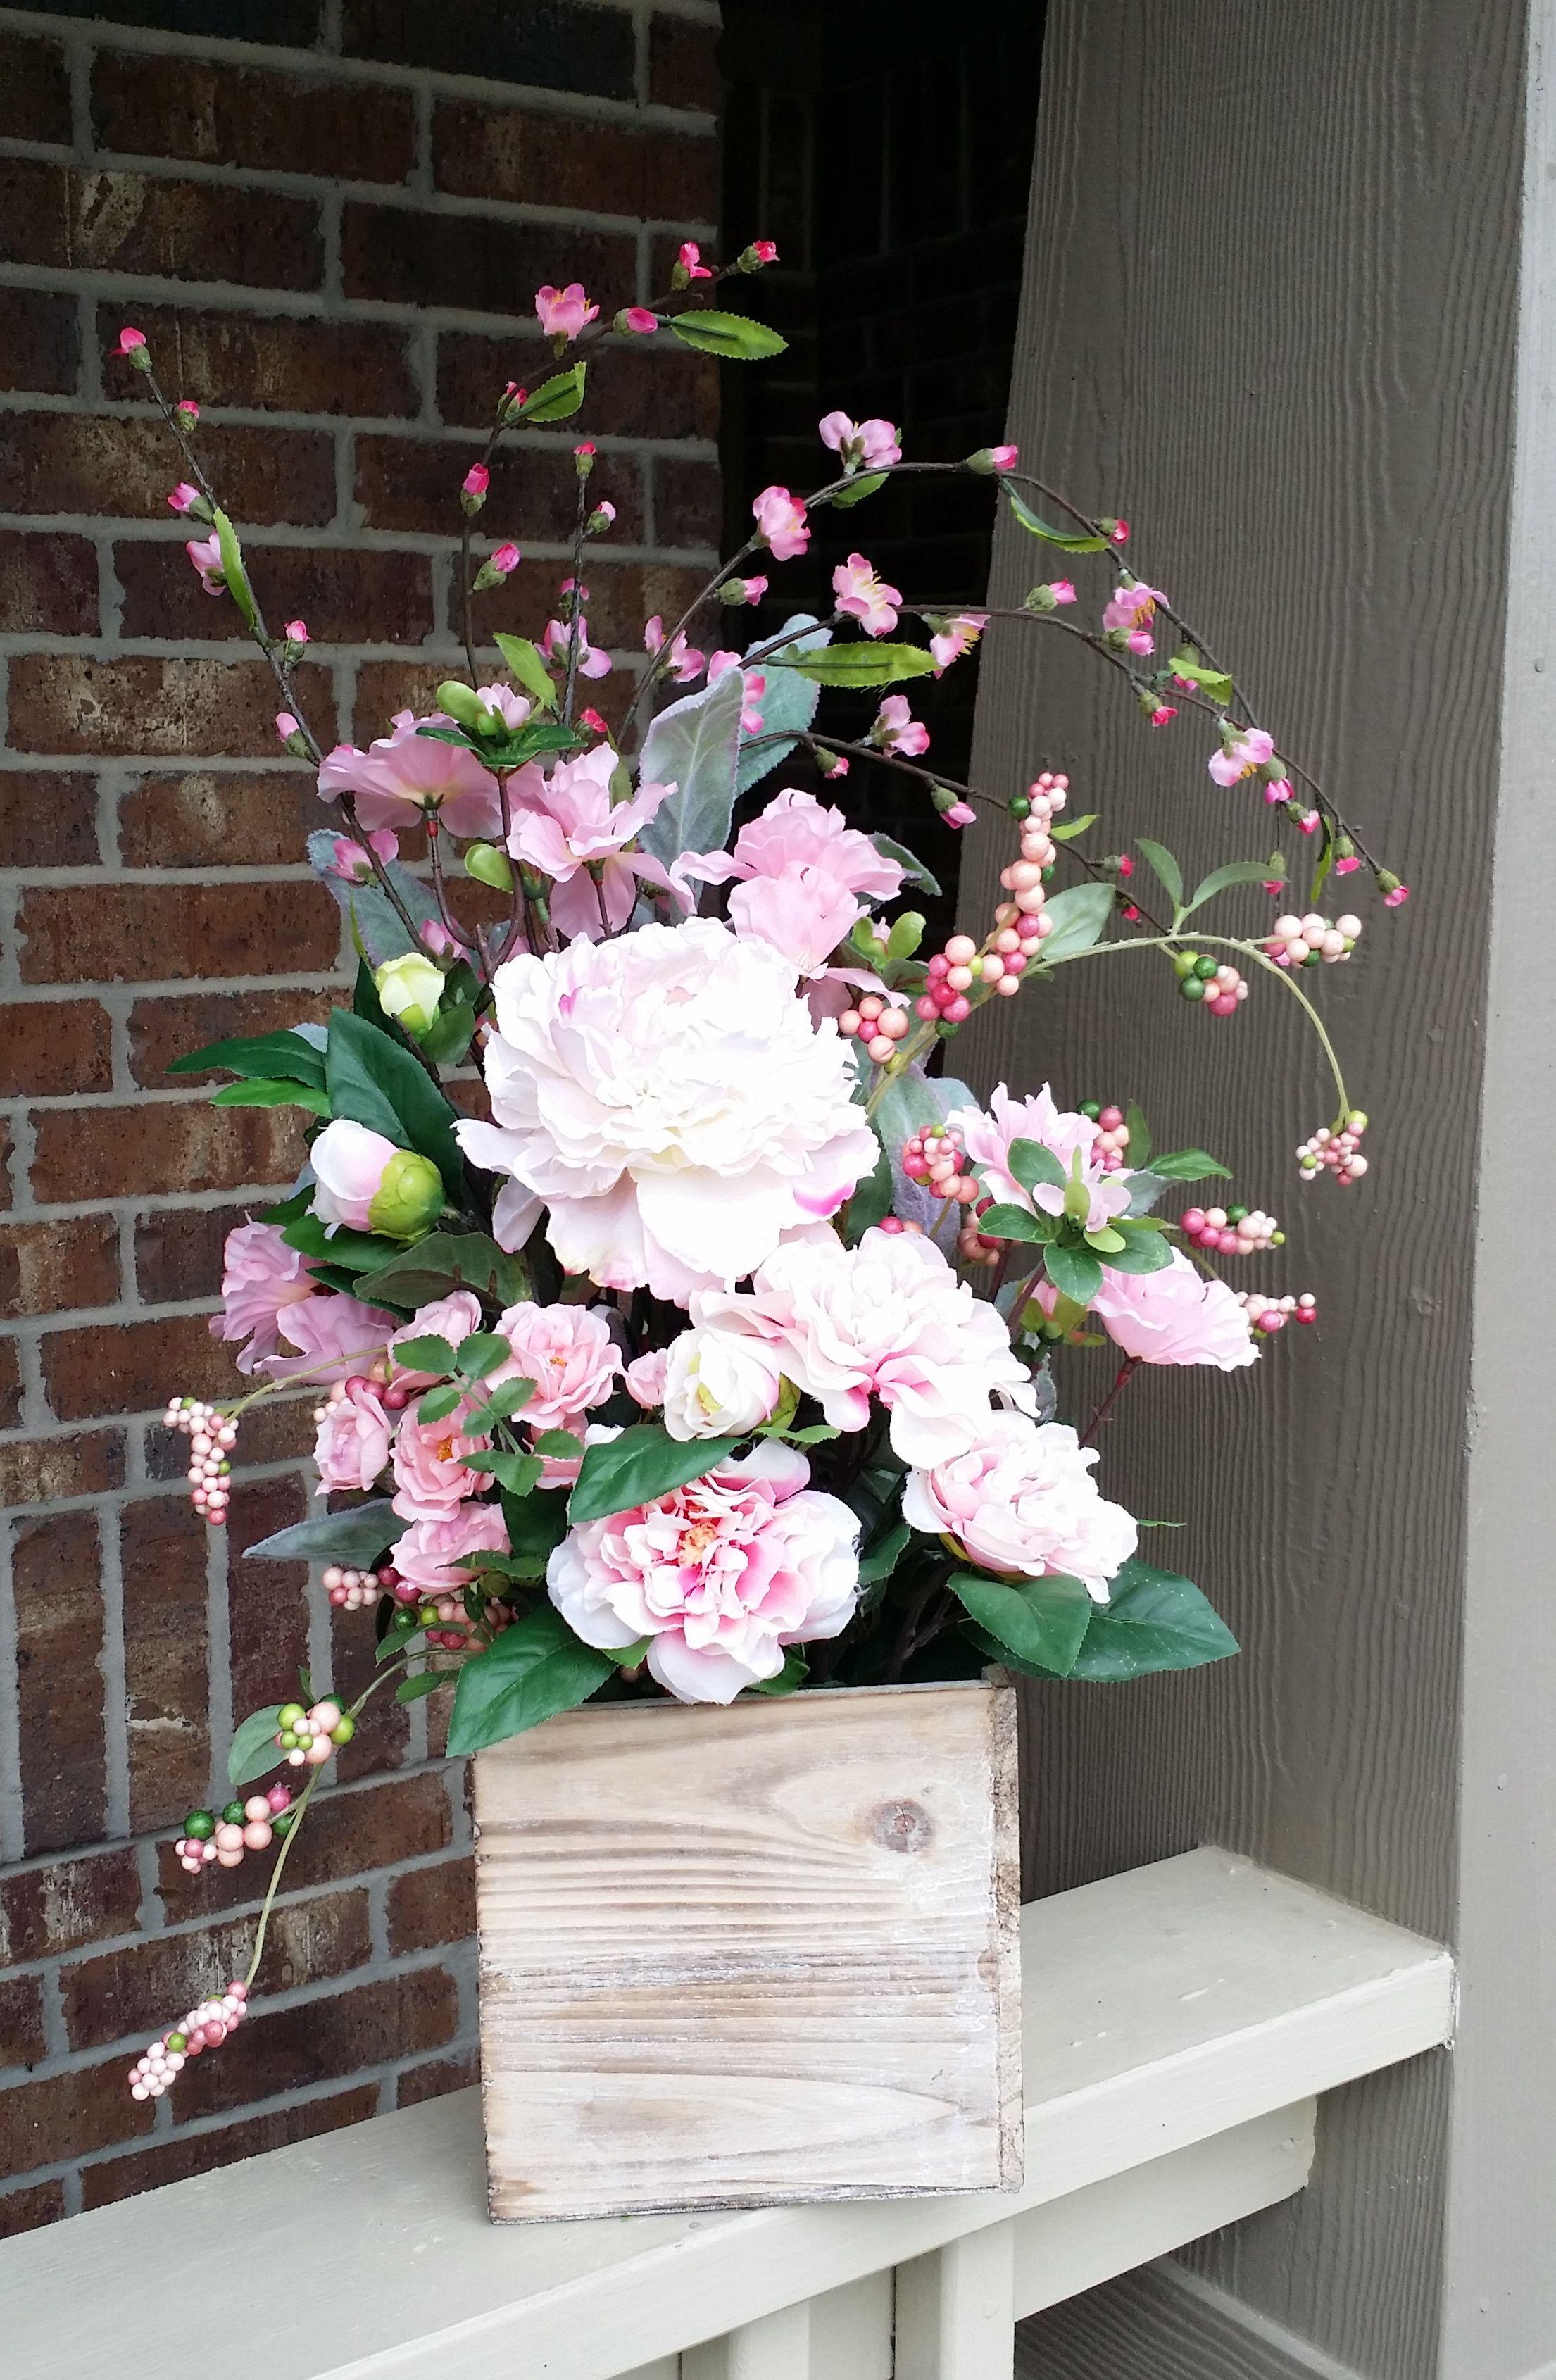 Spring floral home house designer today spring floral pink floral in rustic wood box spring home decor rh pinterest com spring floral comforter spring flower hotel mightylinksfo